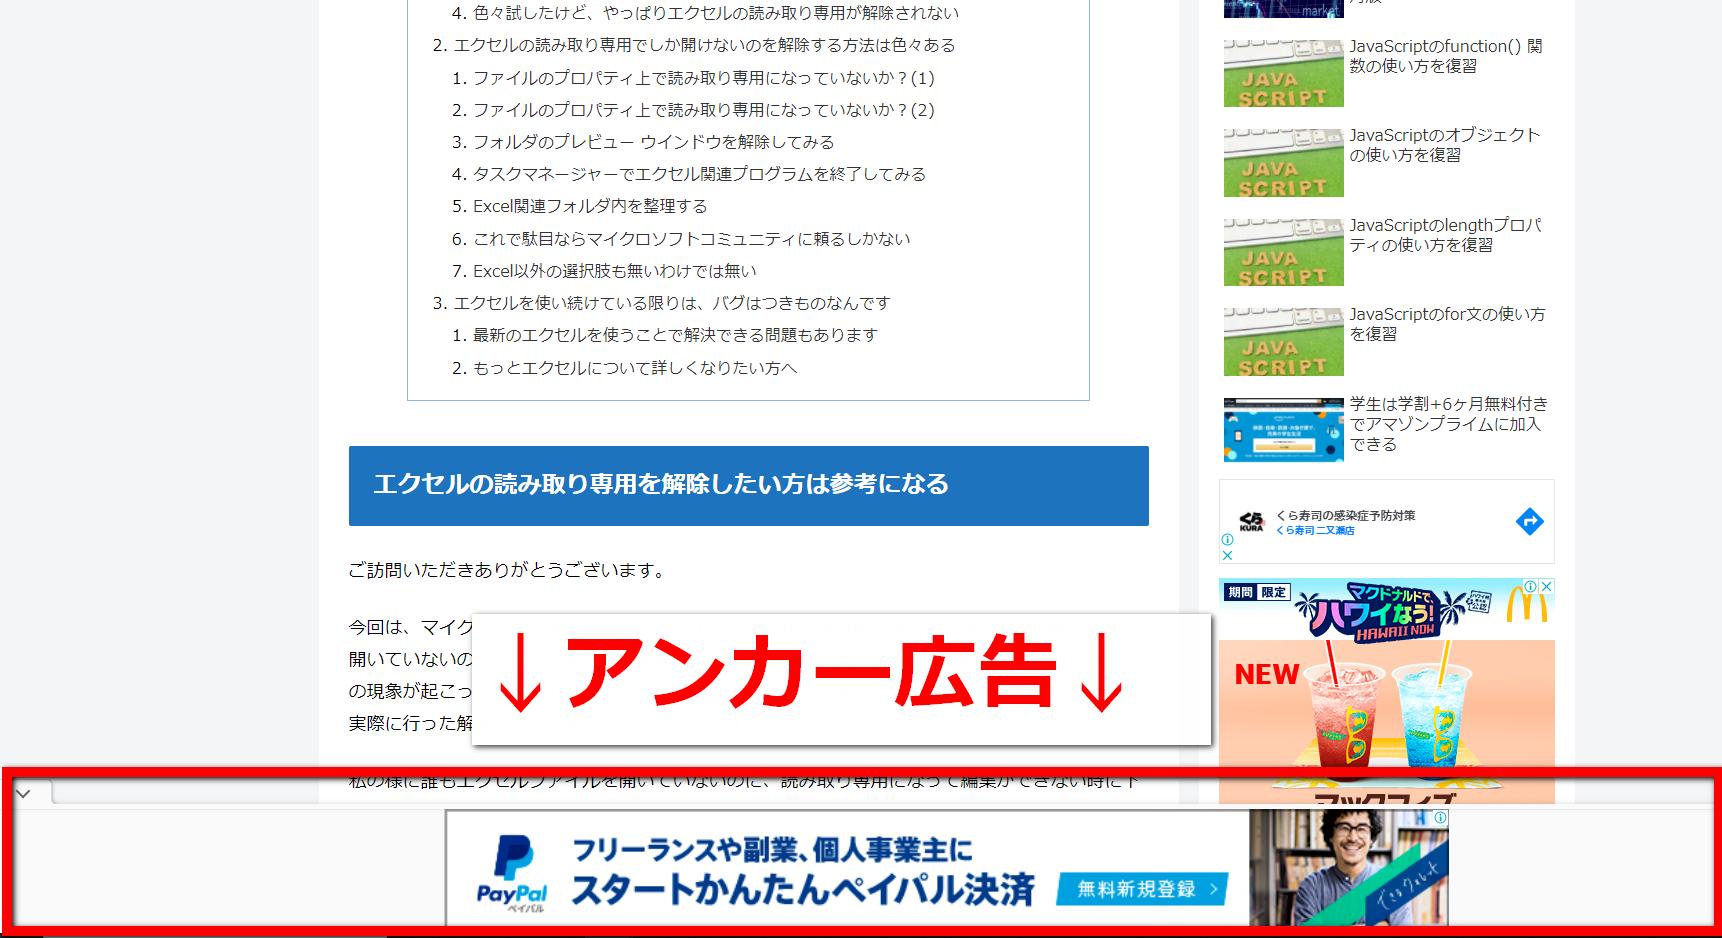 AdSenseアンカー広告